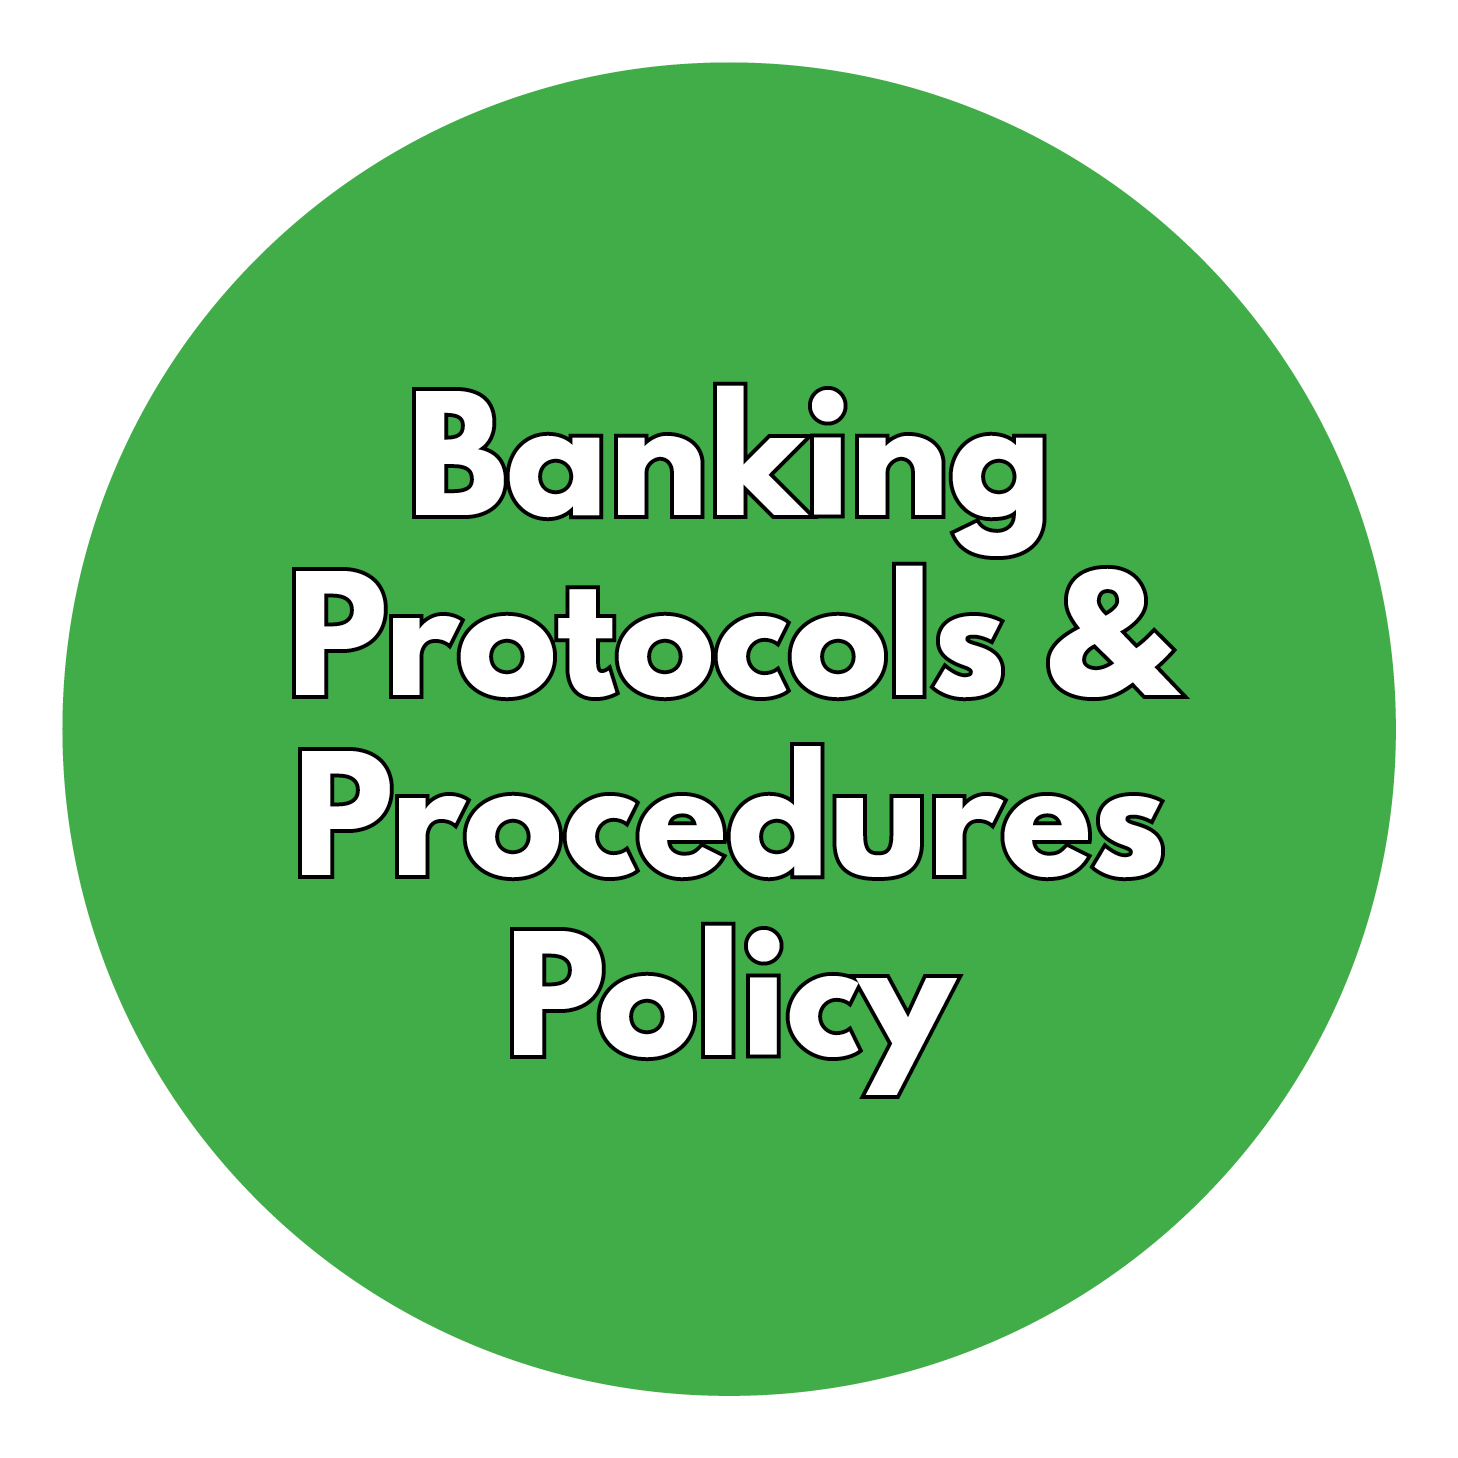 banking protocols and procedures.jpg